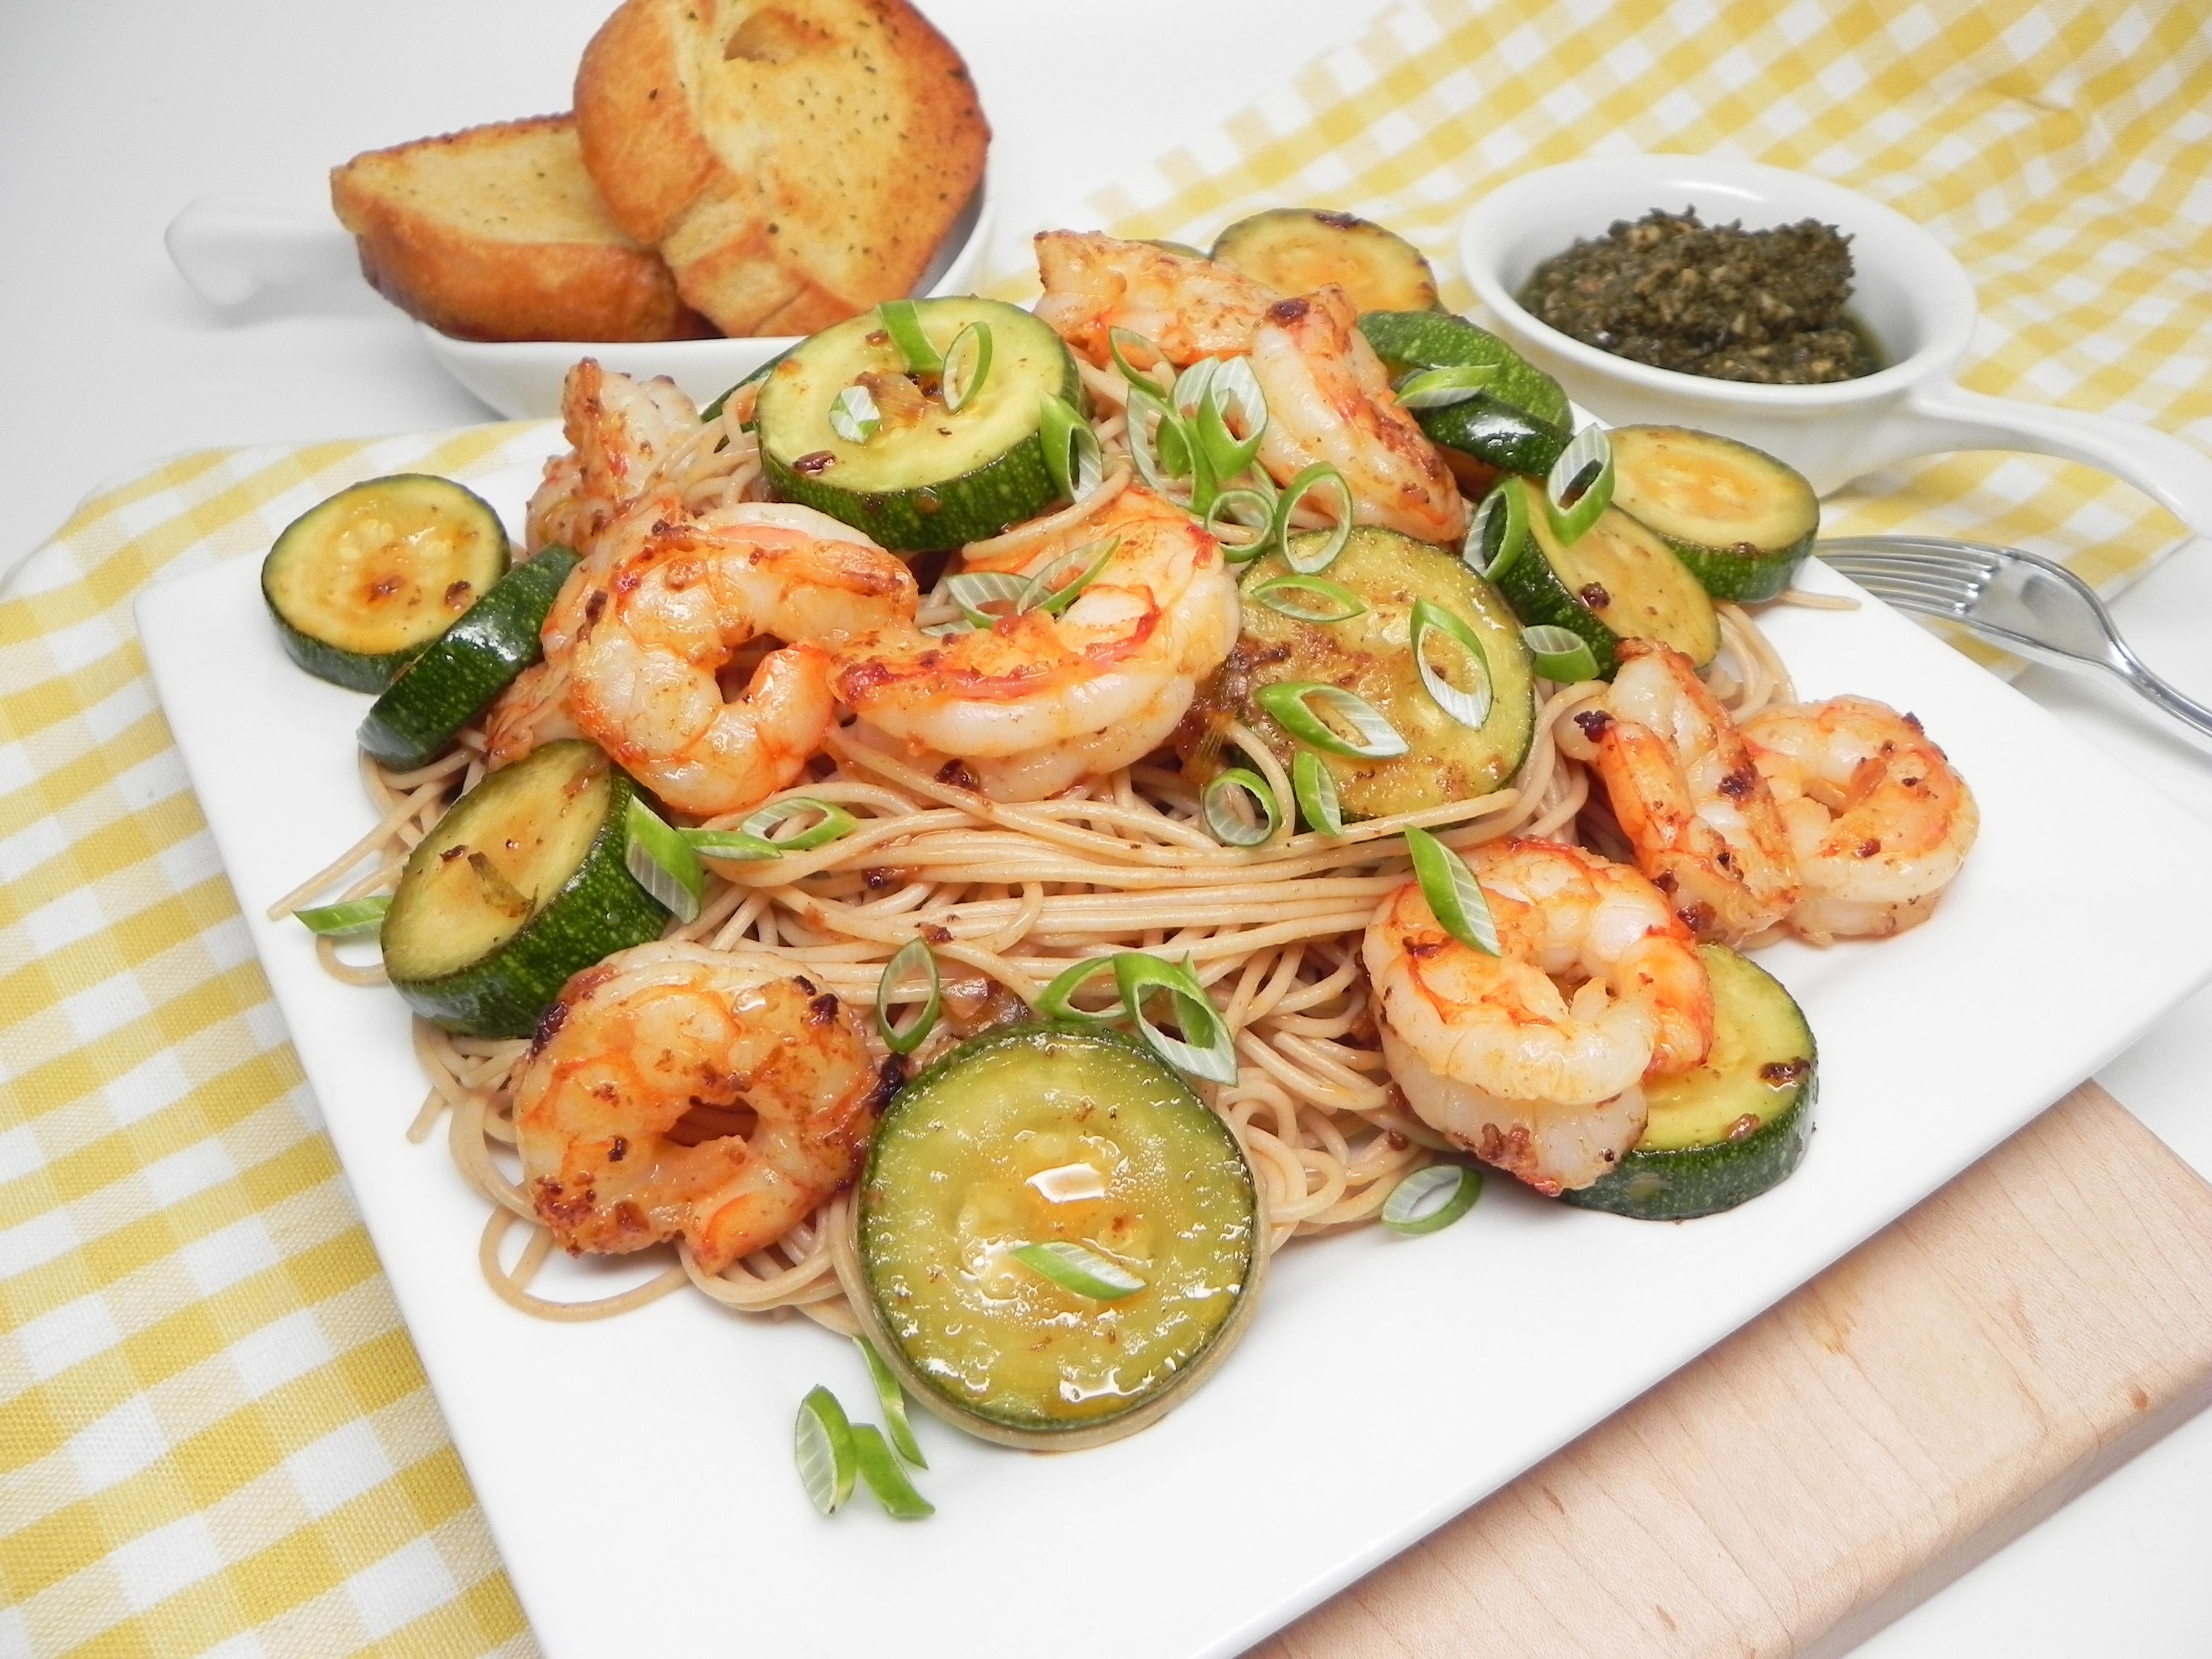 Summery Shrimp with Pesto